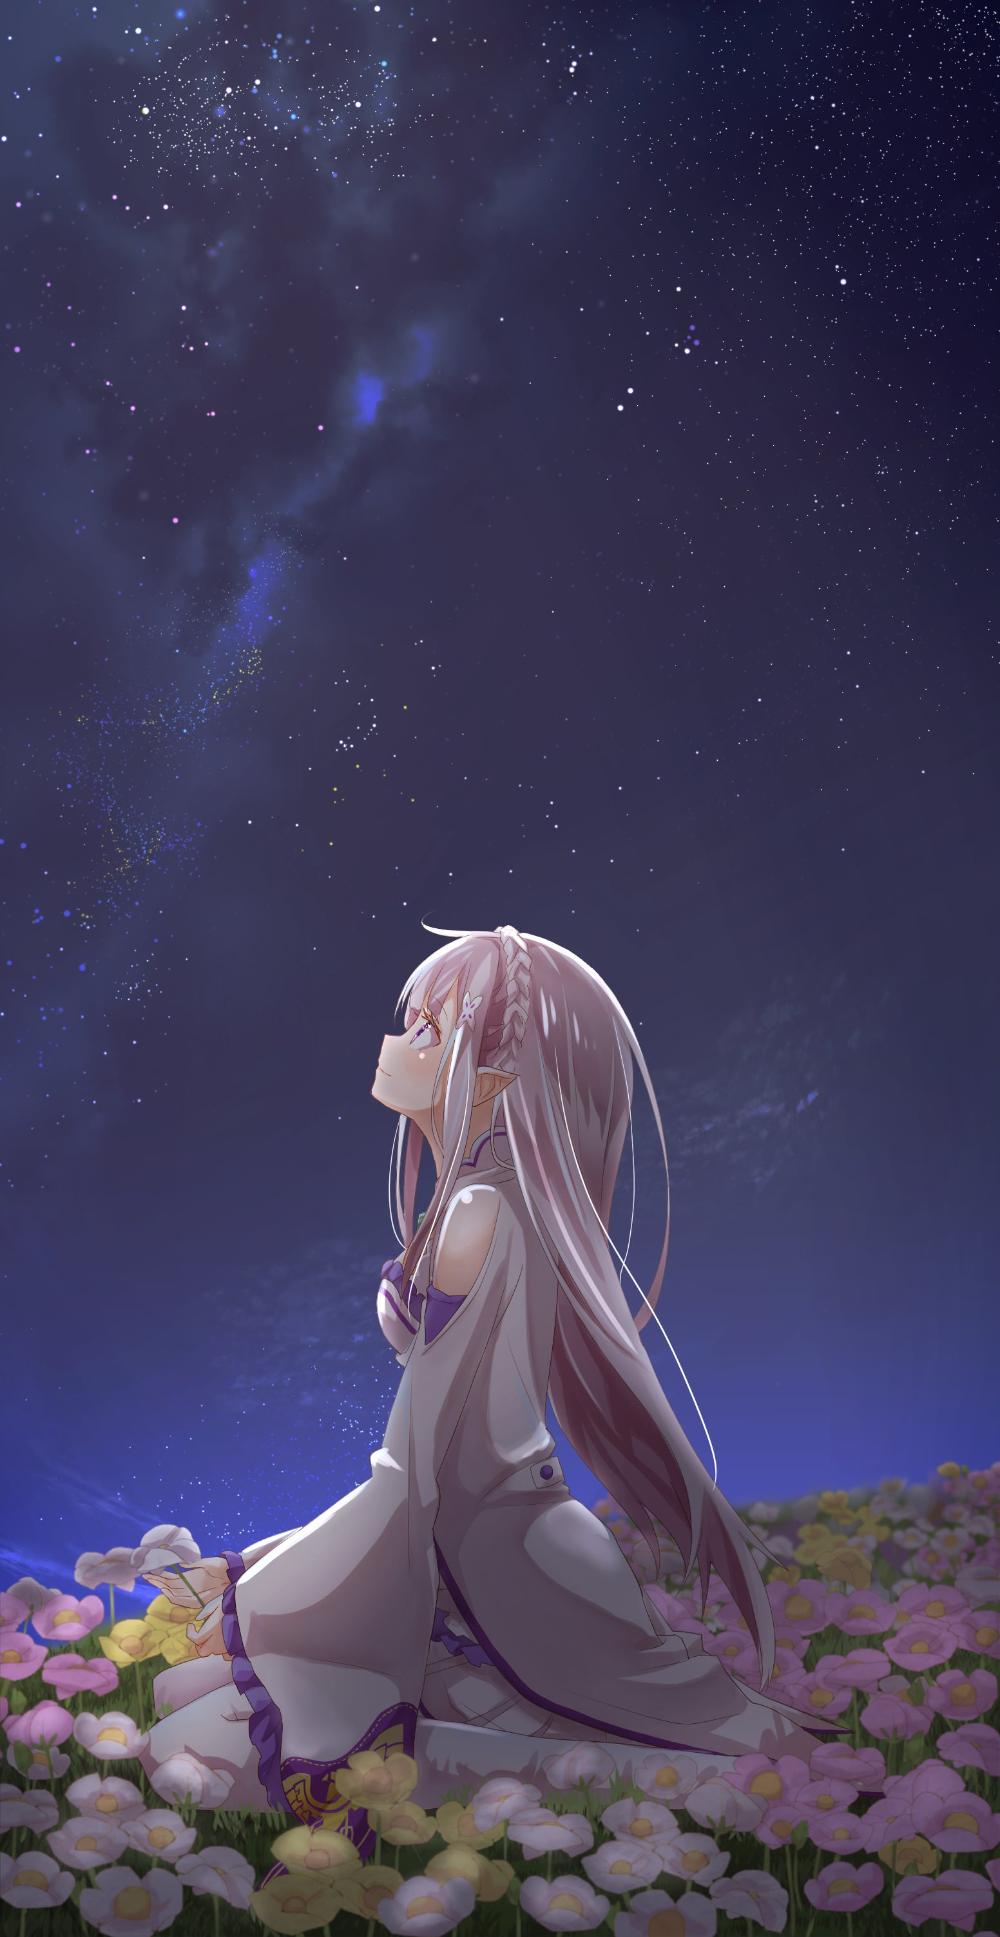 4k Resolution Ultra Hd 4k High Quality Anime Wallpaper